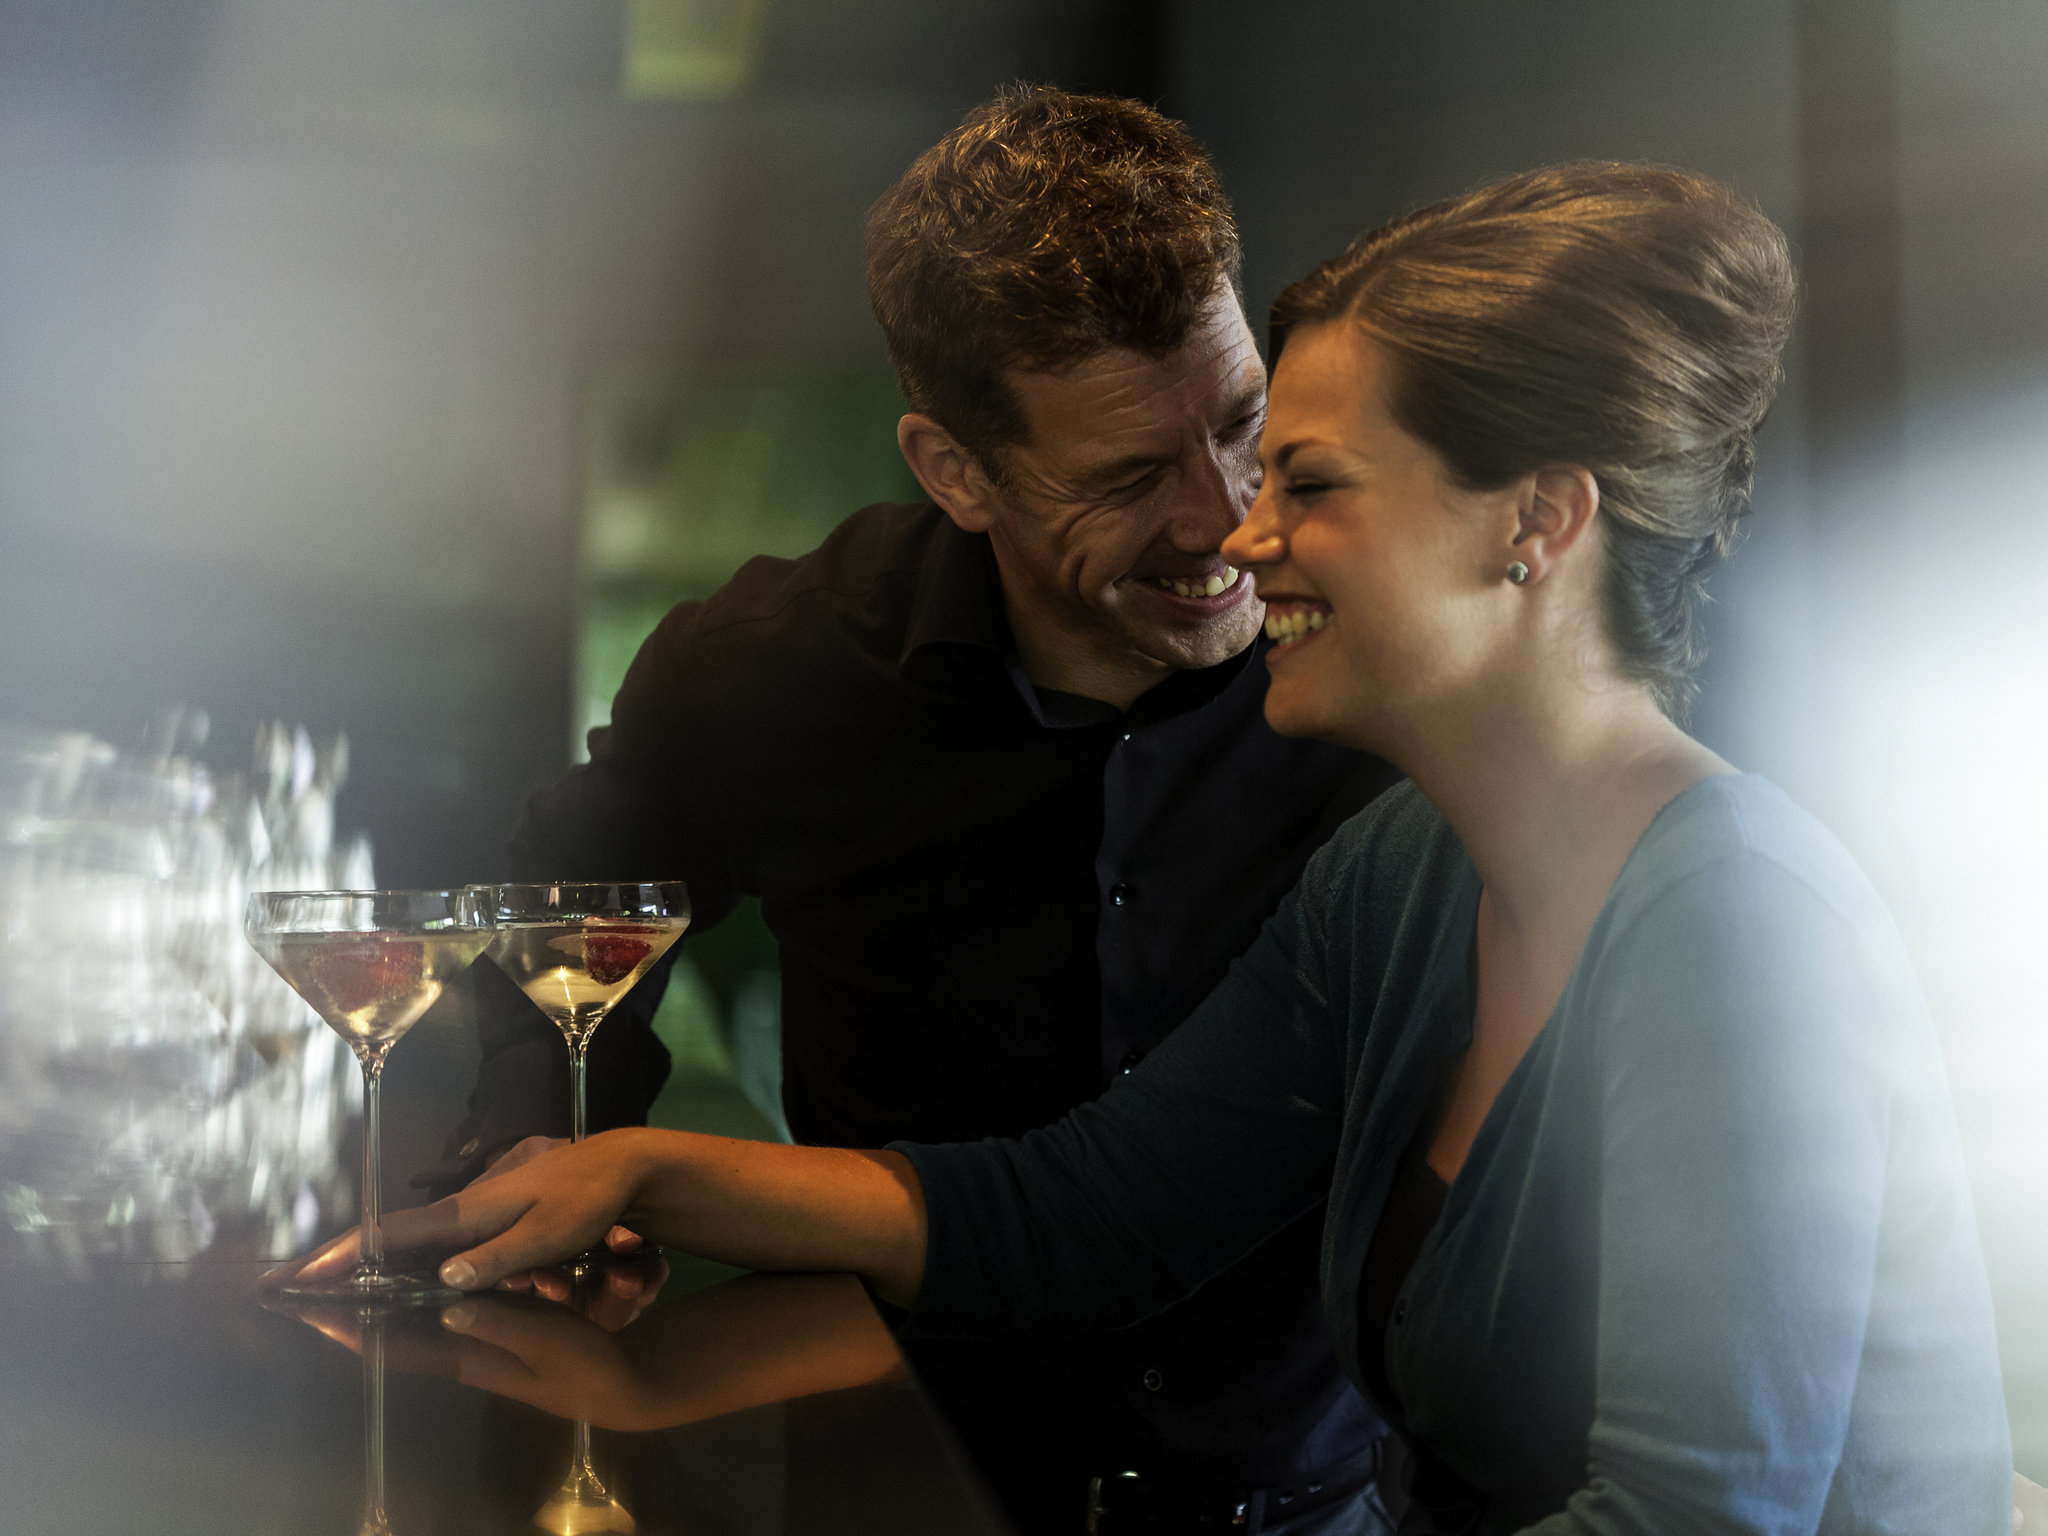 gratis online dating India Hyderabad incontri online per giovani single